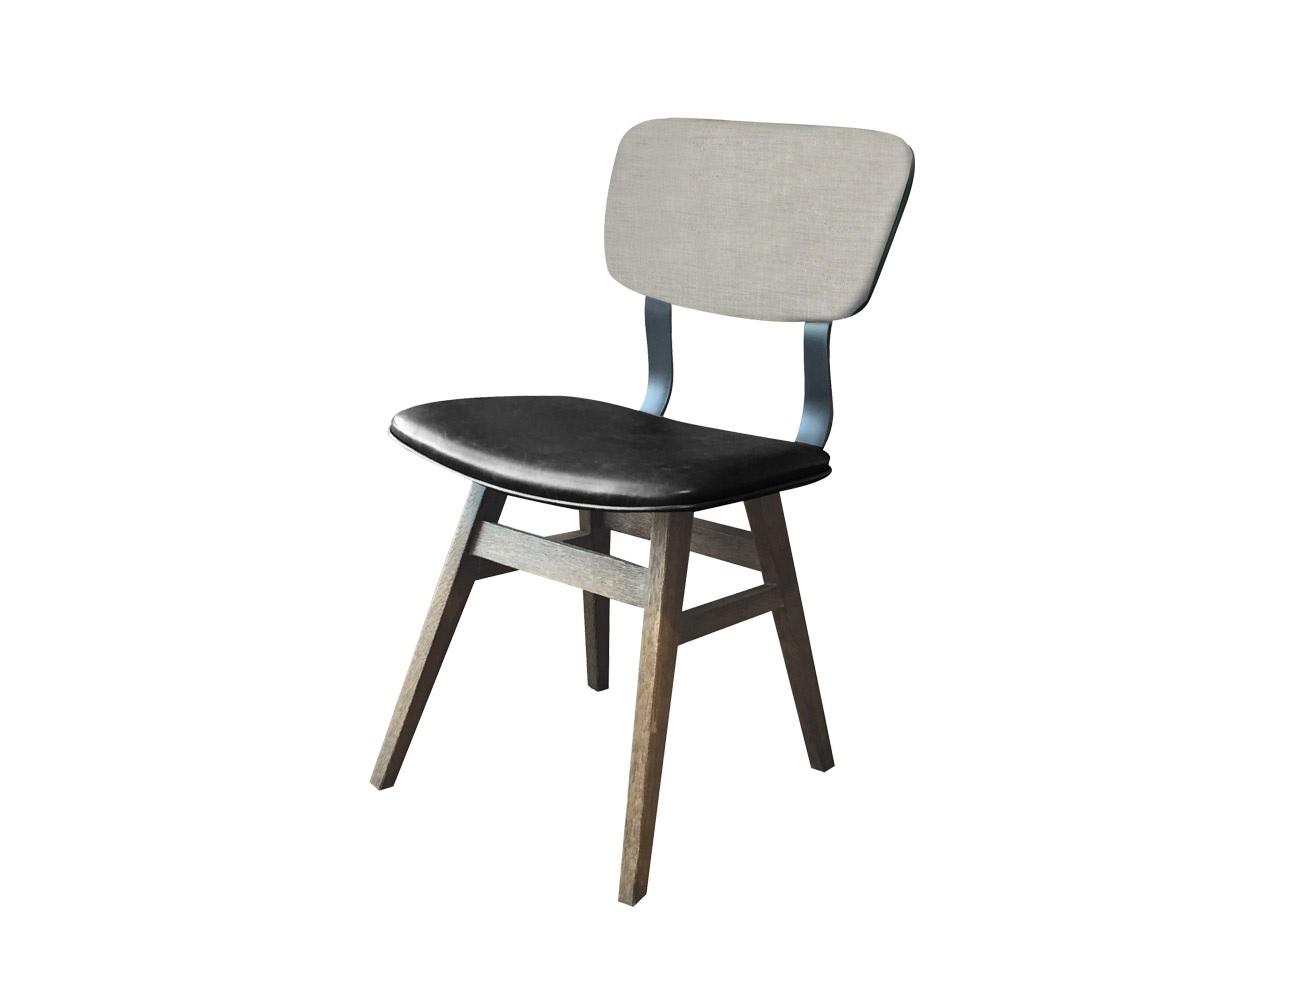 Стул Lunet Side ChairОбеденные стулья<br><br><br>Material: Дерево<br>Ширина см: 47<br>Высота см: 84<br>Глубина см: 54